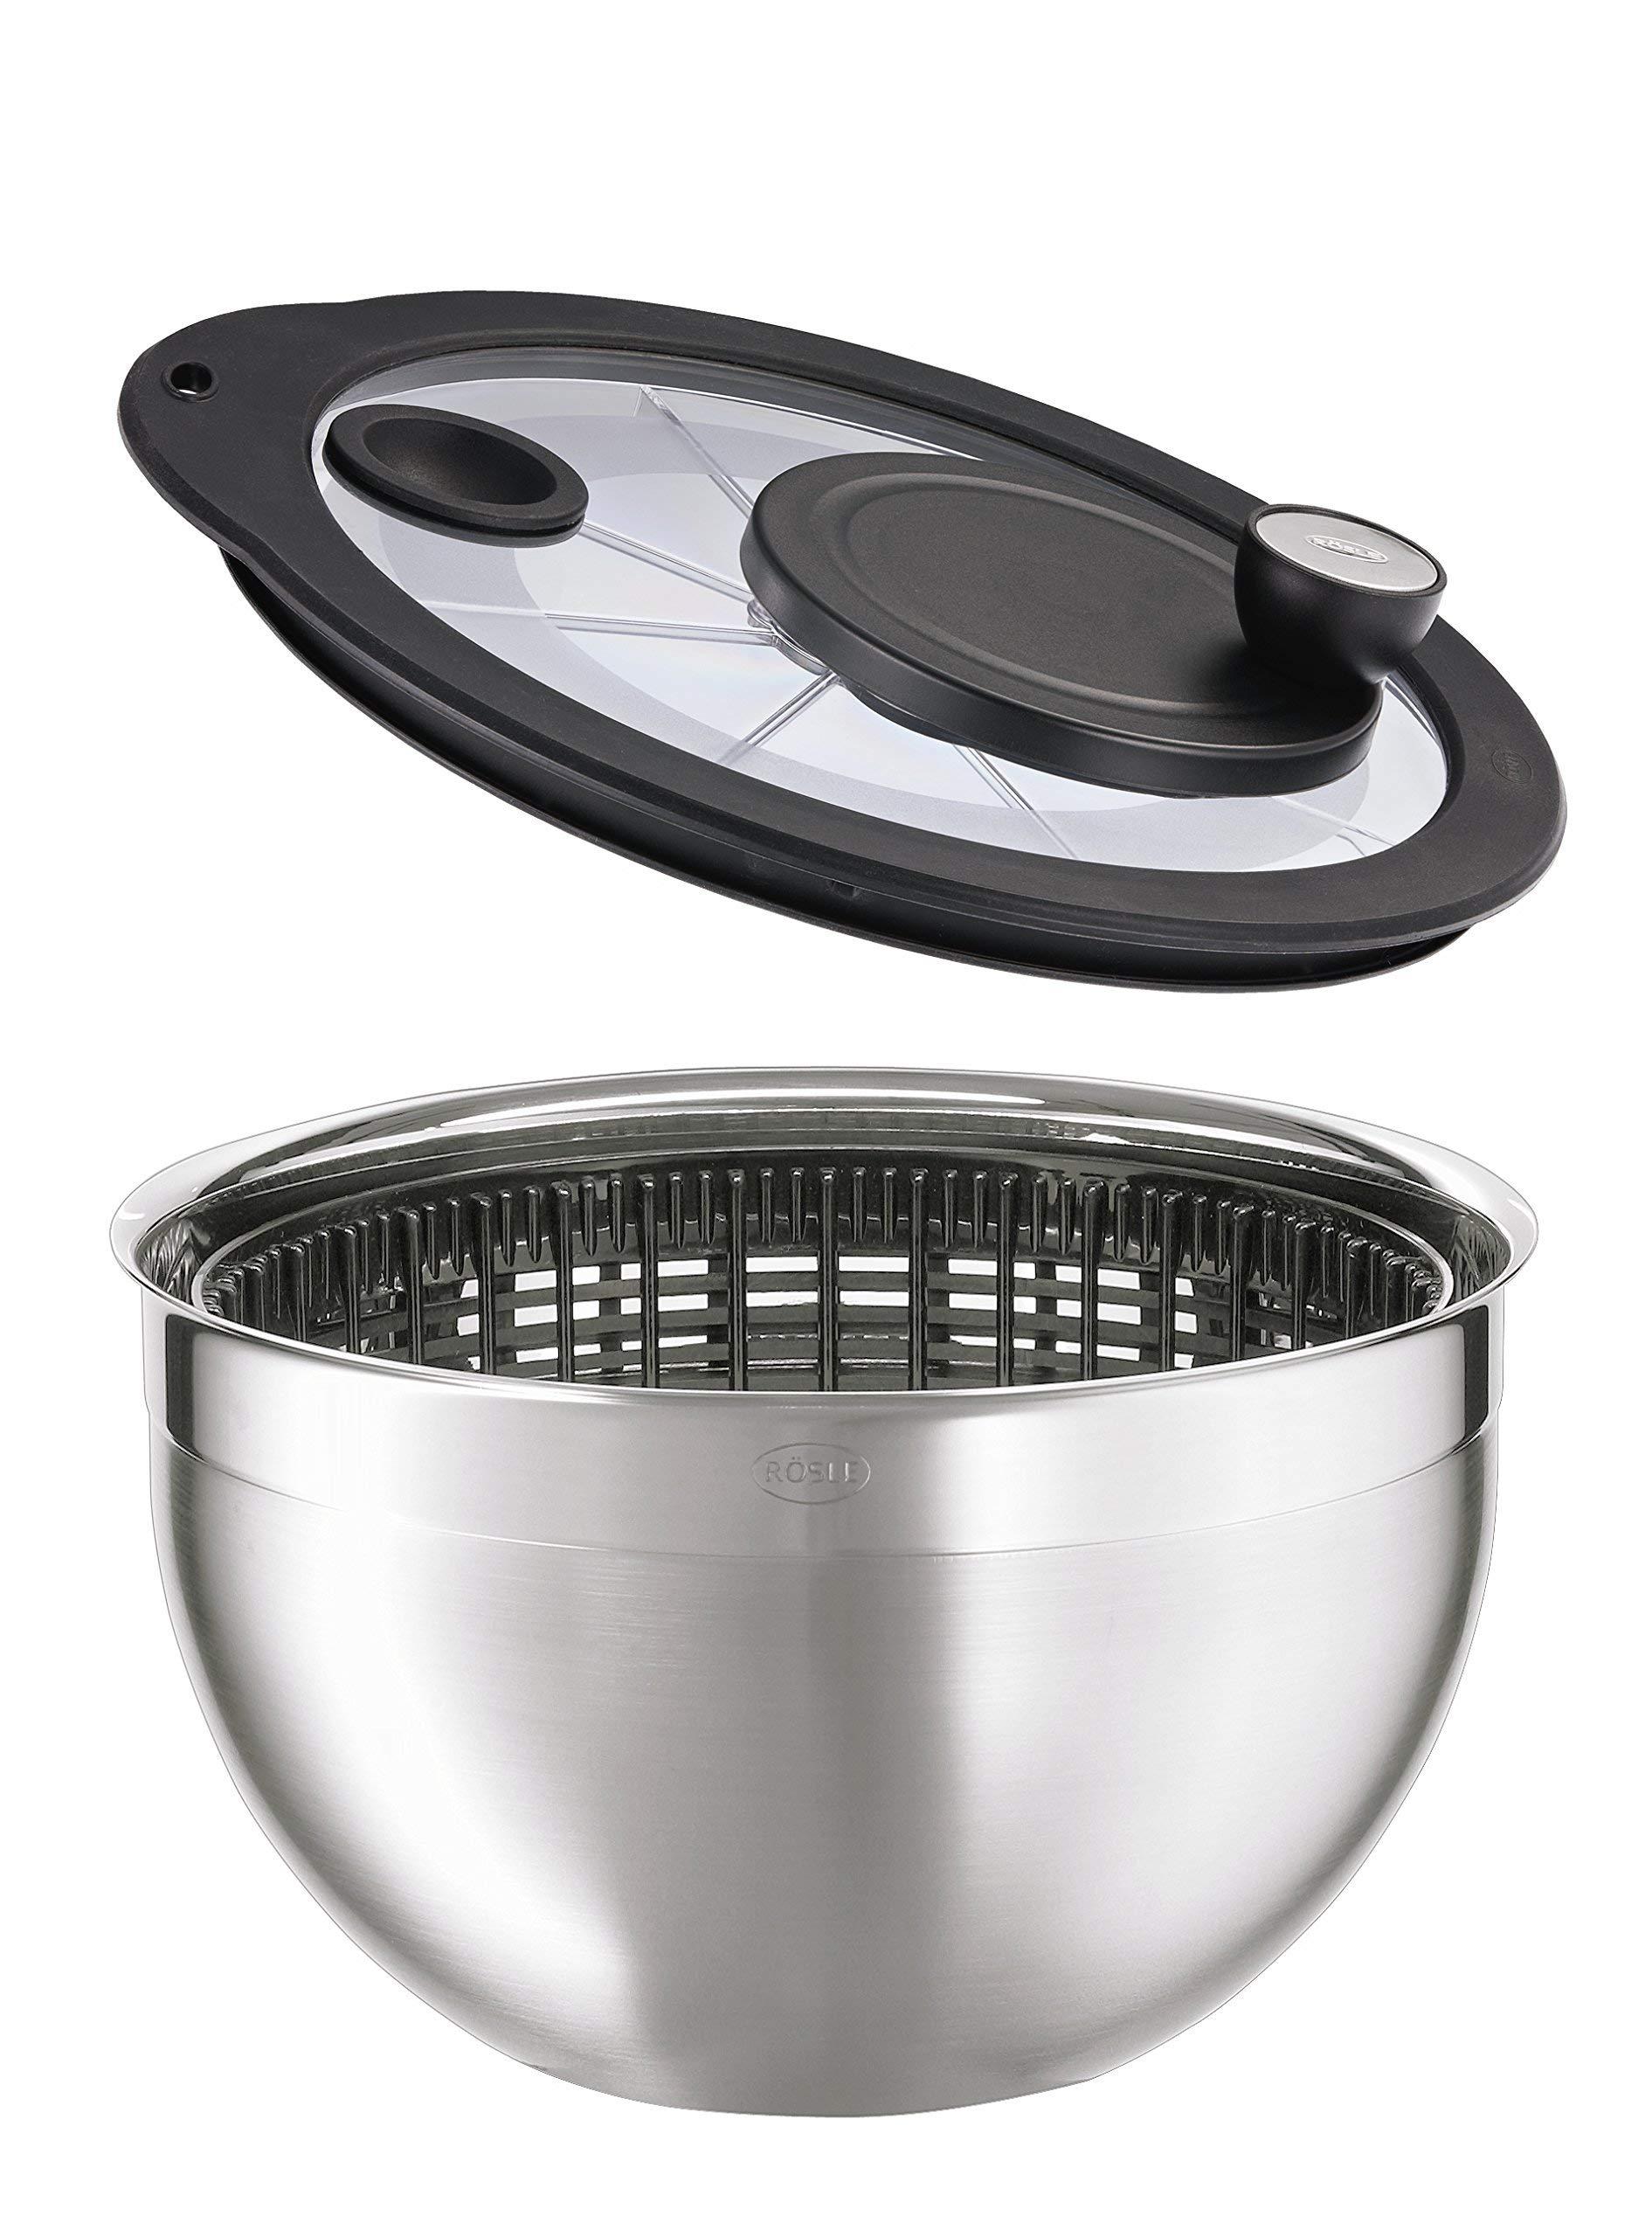 Rosle Stainless Steel Salad-Spinner, Large by Rosle